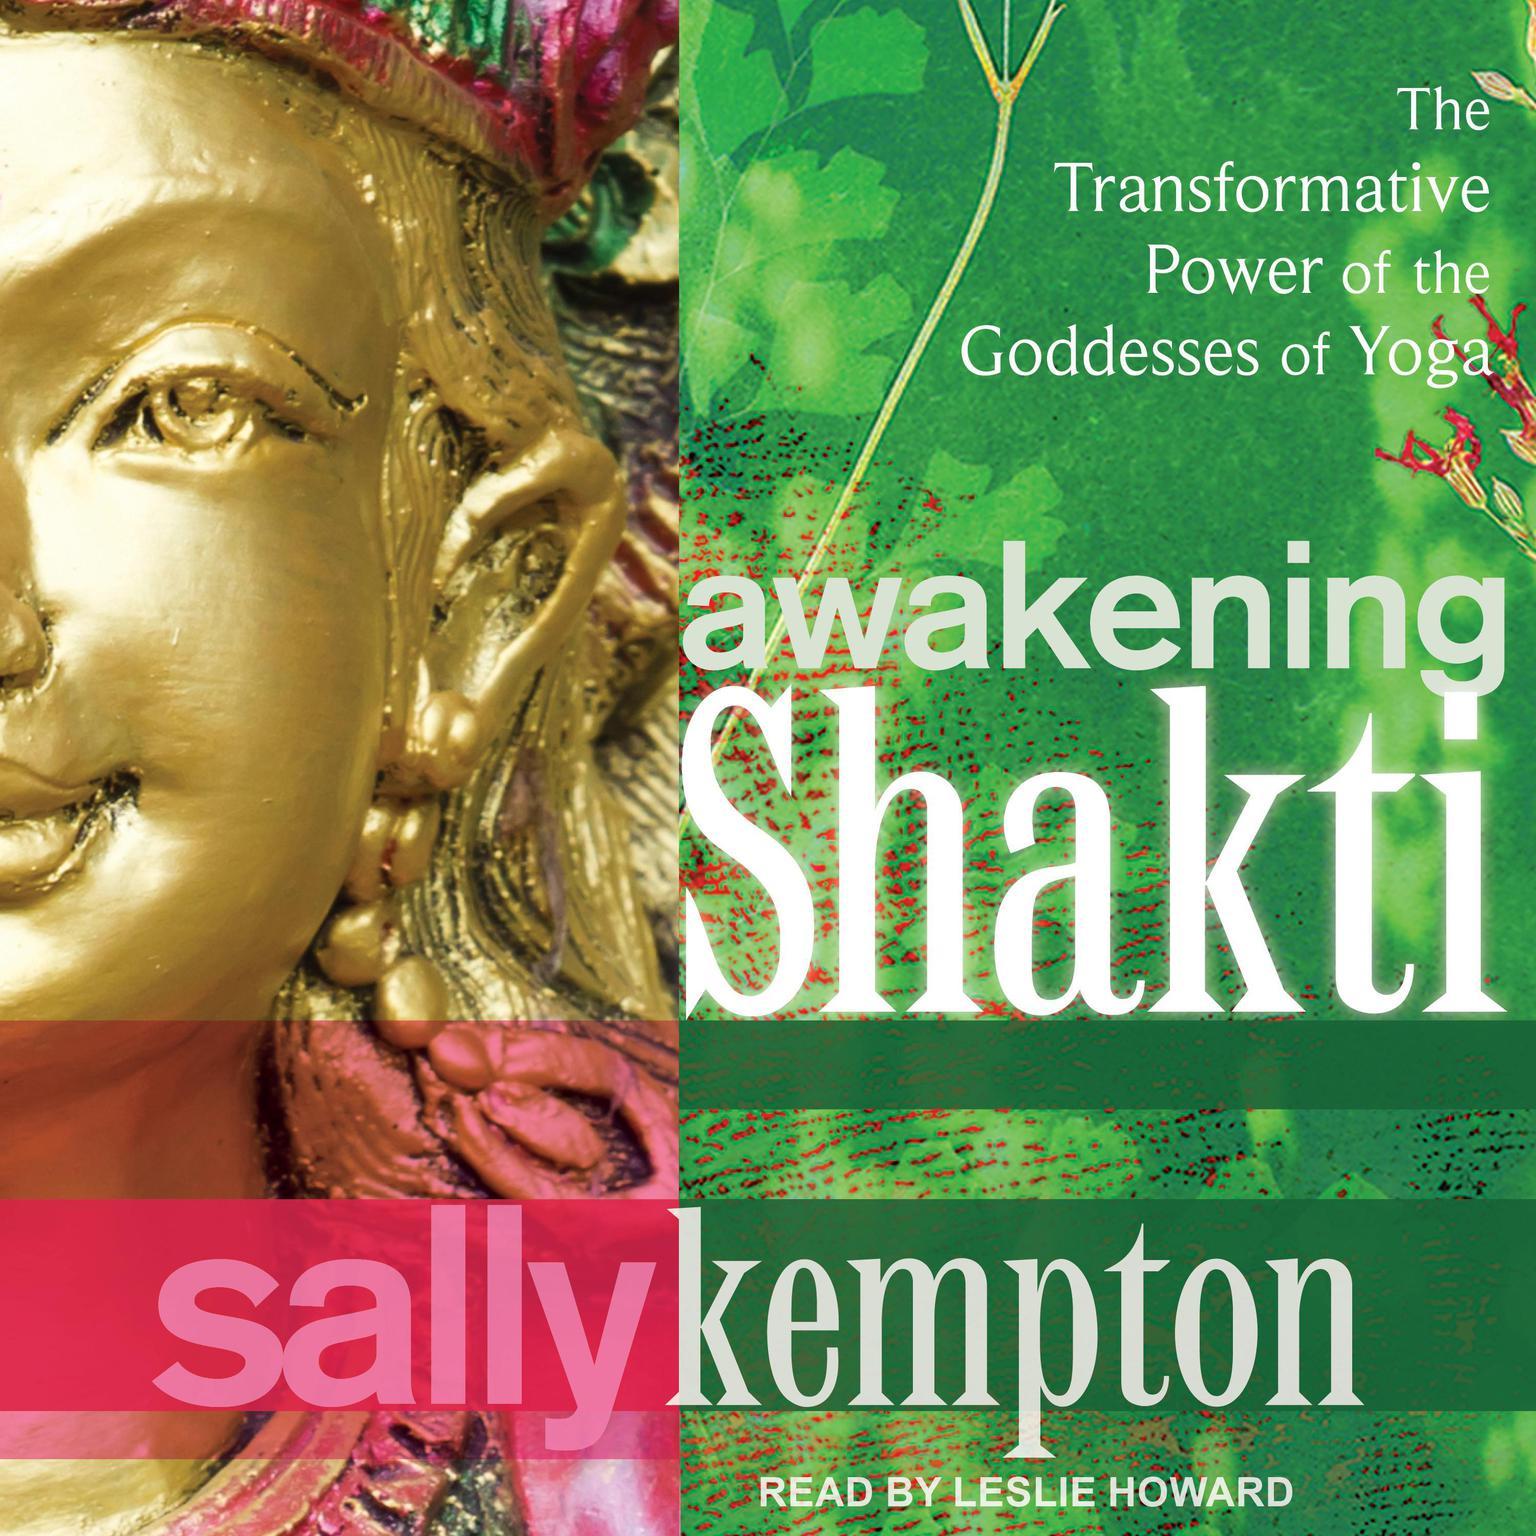 Printable Awakening Shakti: The Transformative Power of the Goddesses of Yoga Audiobook Cover Art